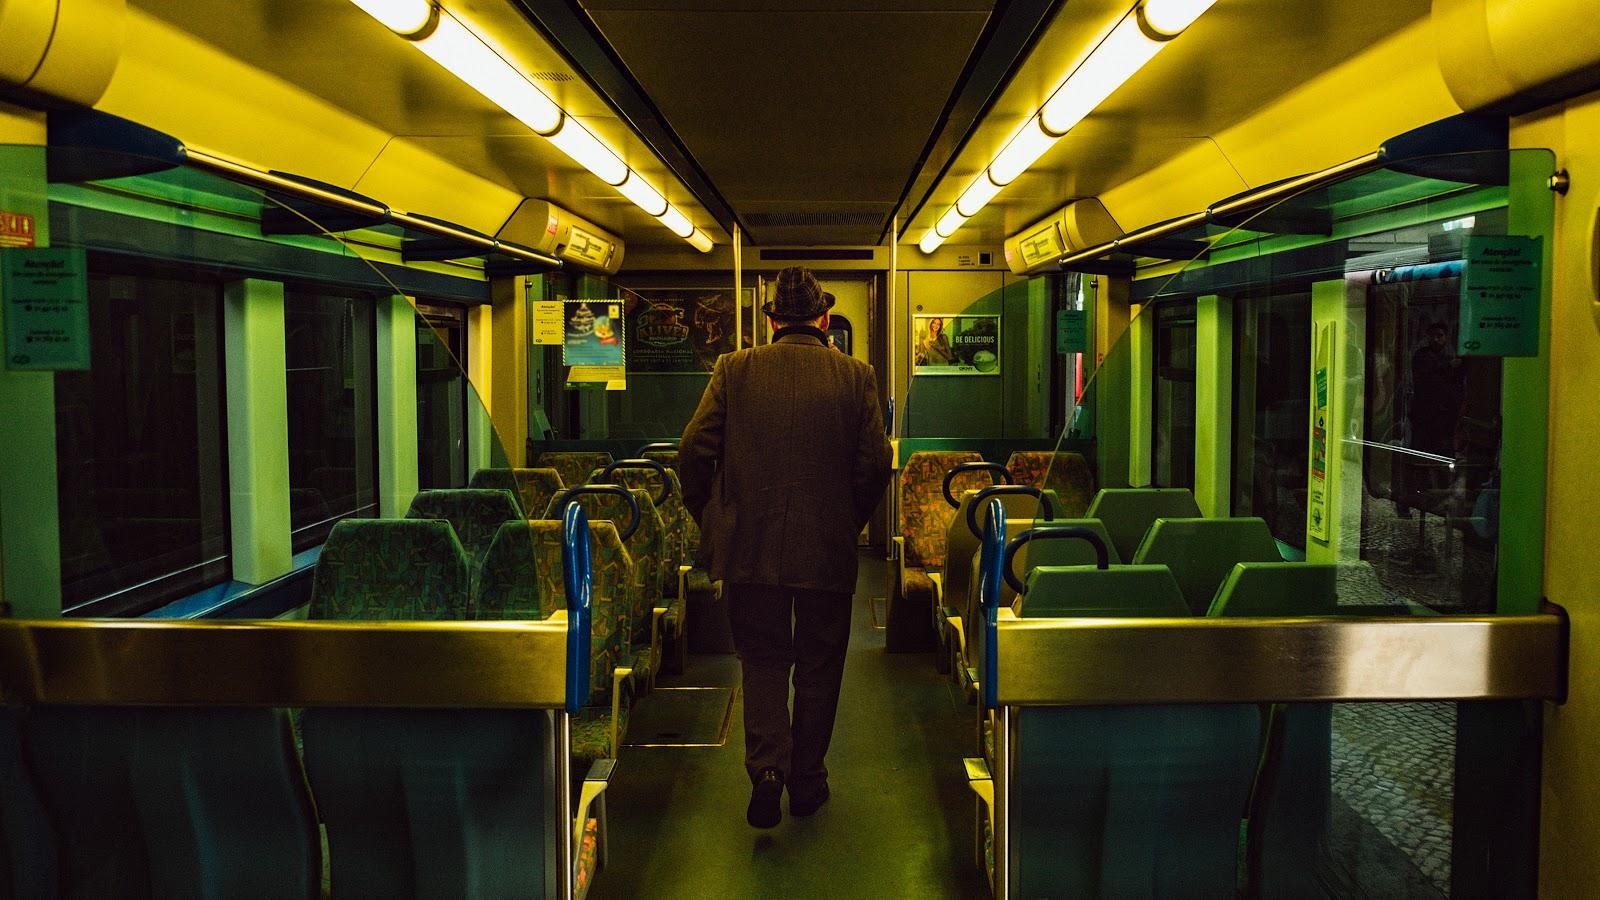 Public transportation for seniors